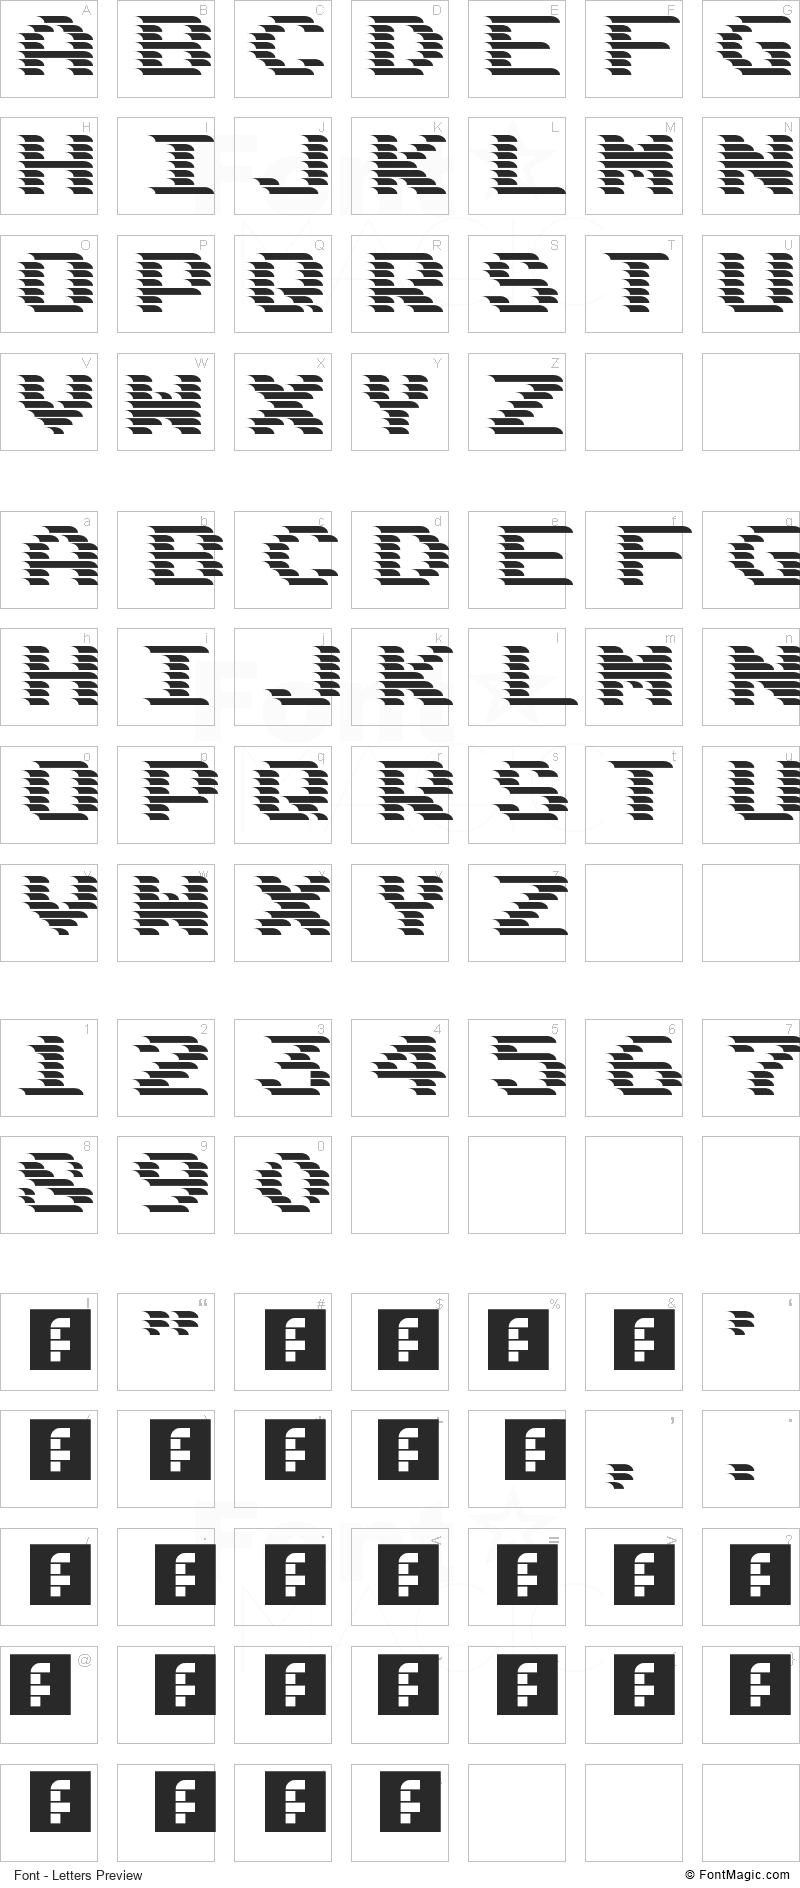 DeadCRT Font - All Latters Preview Chart